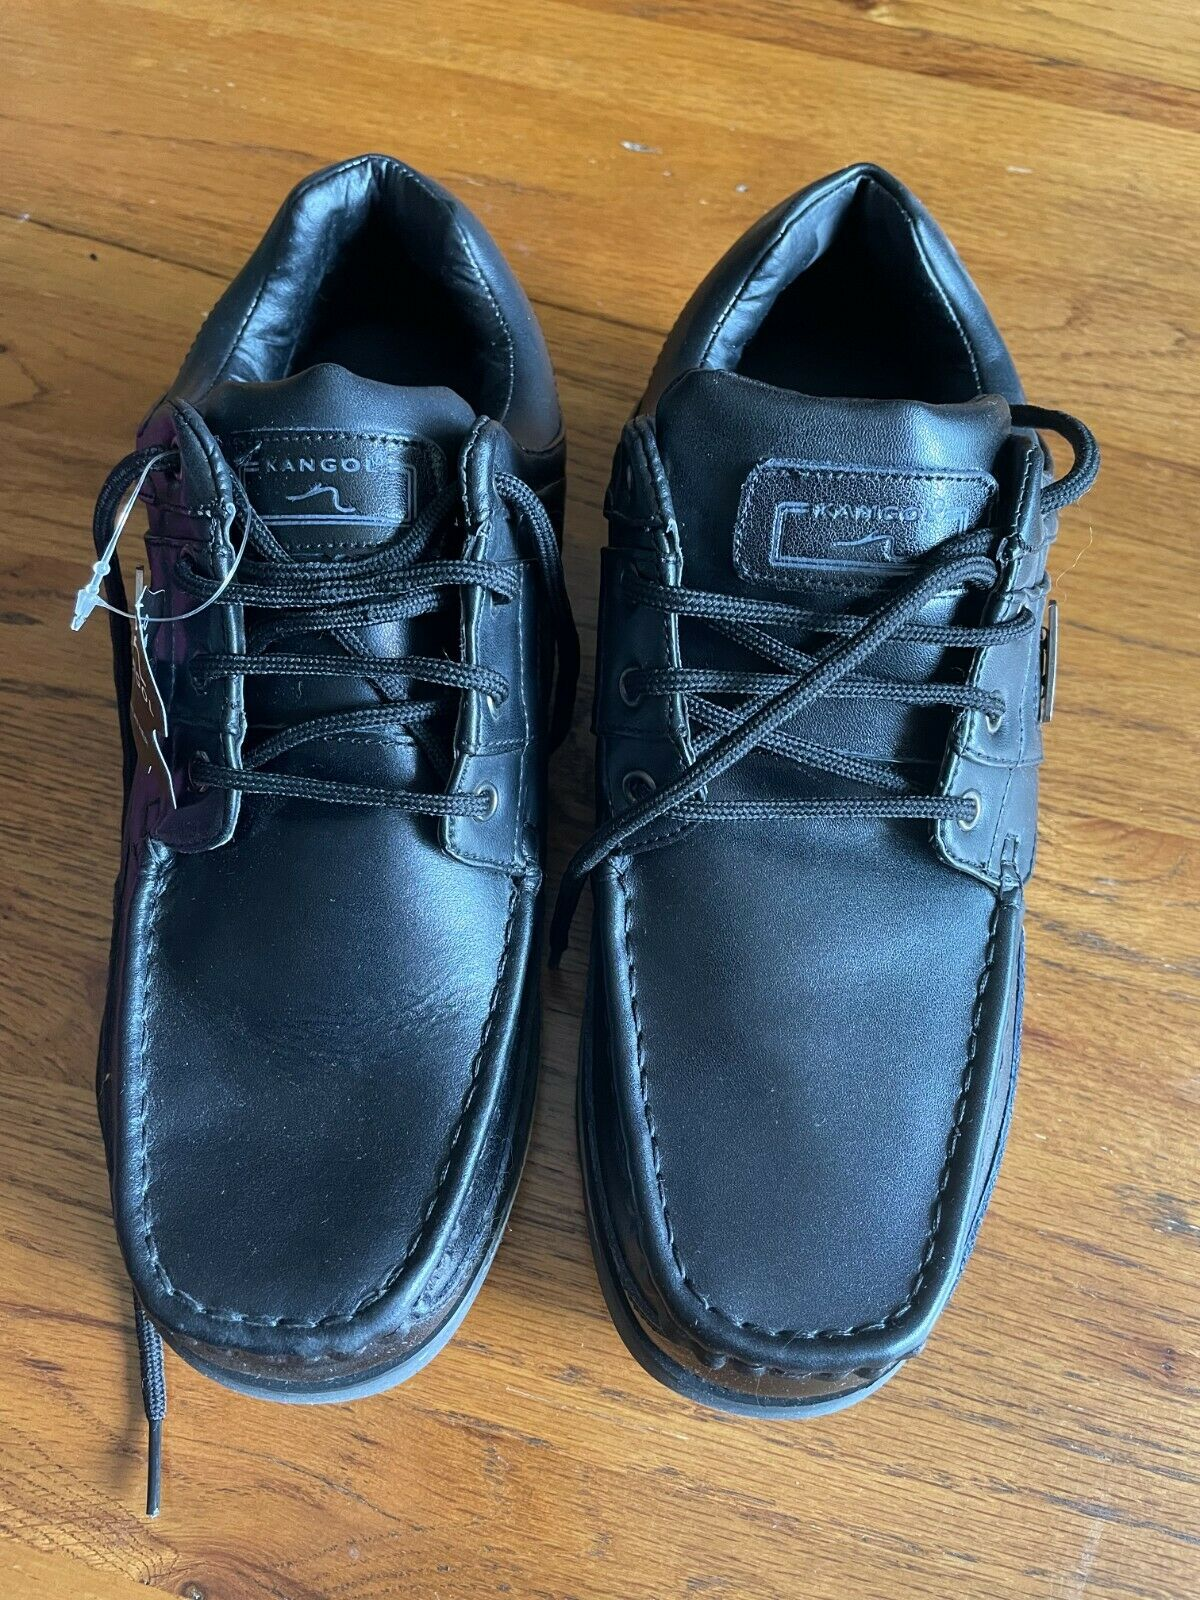 Kangol BTS Stenor Mens Shoes in Black UK Size 8